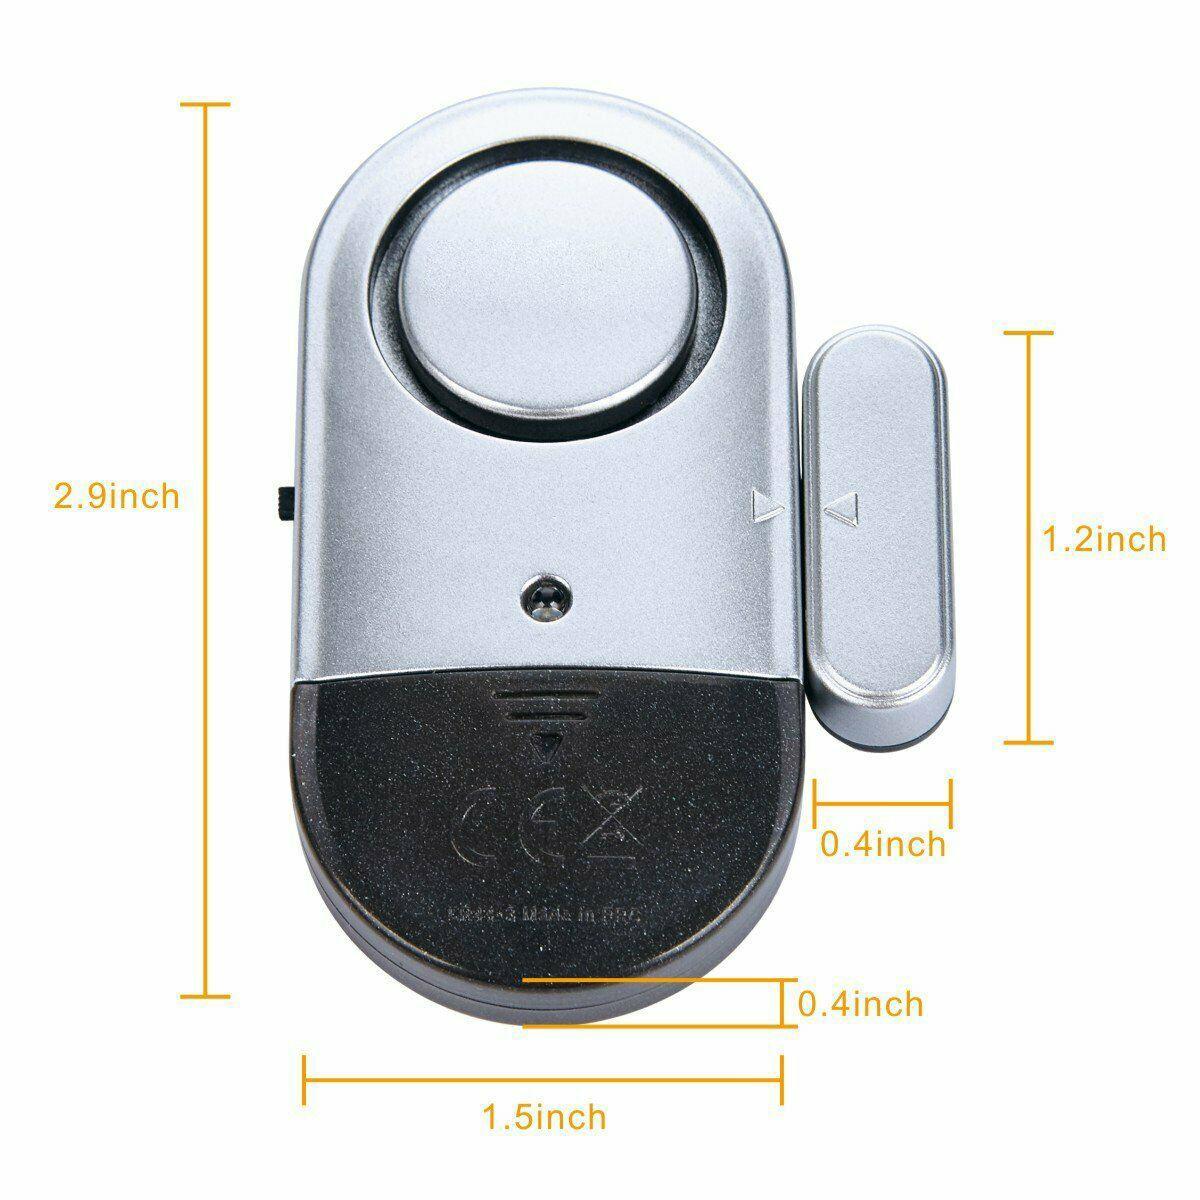 lowest price Newest 8CH MINI NVR CCTV NVR Network H 265 5MP video Recorder for CCTV Camera IP Camera Cloud P2P eSATA TF USB Remote Control